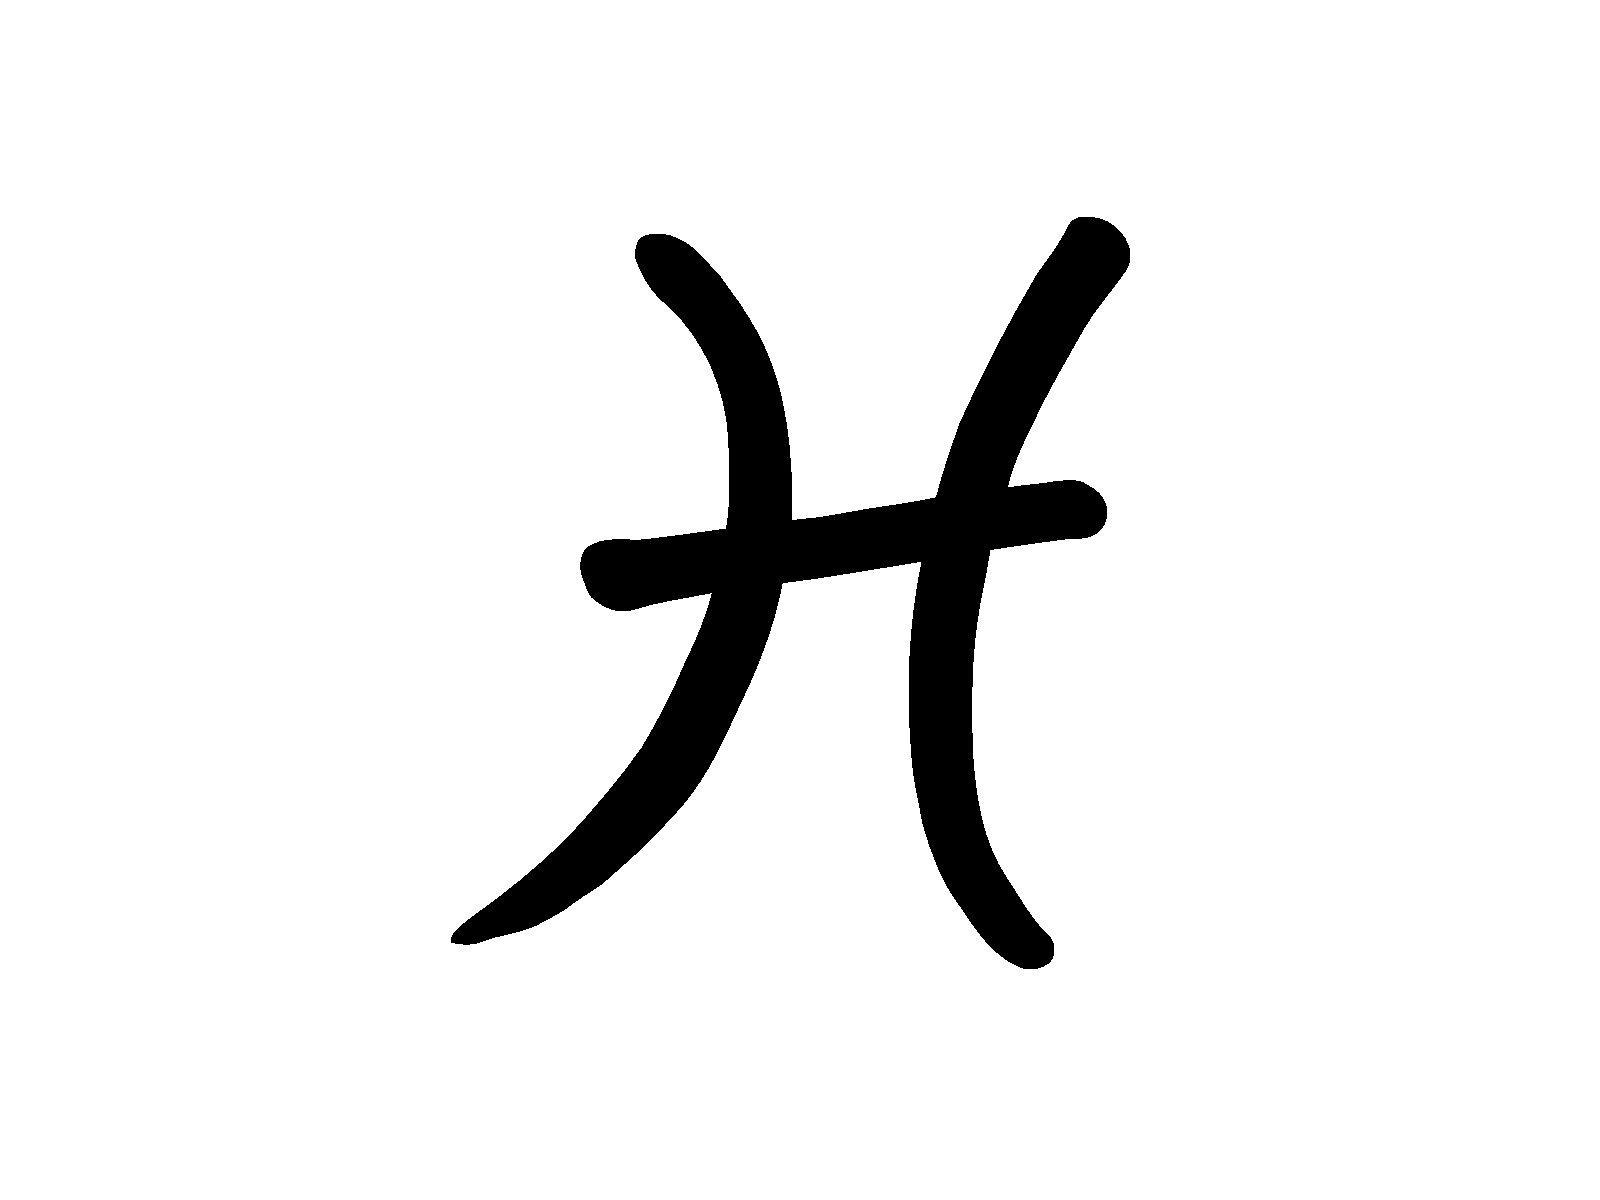 simple black outline pisces zodiac sign tattoo stencil